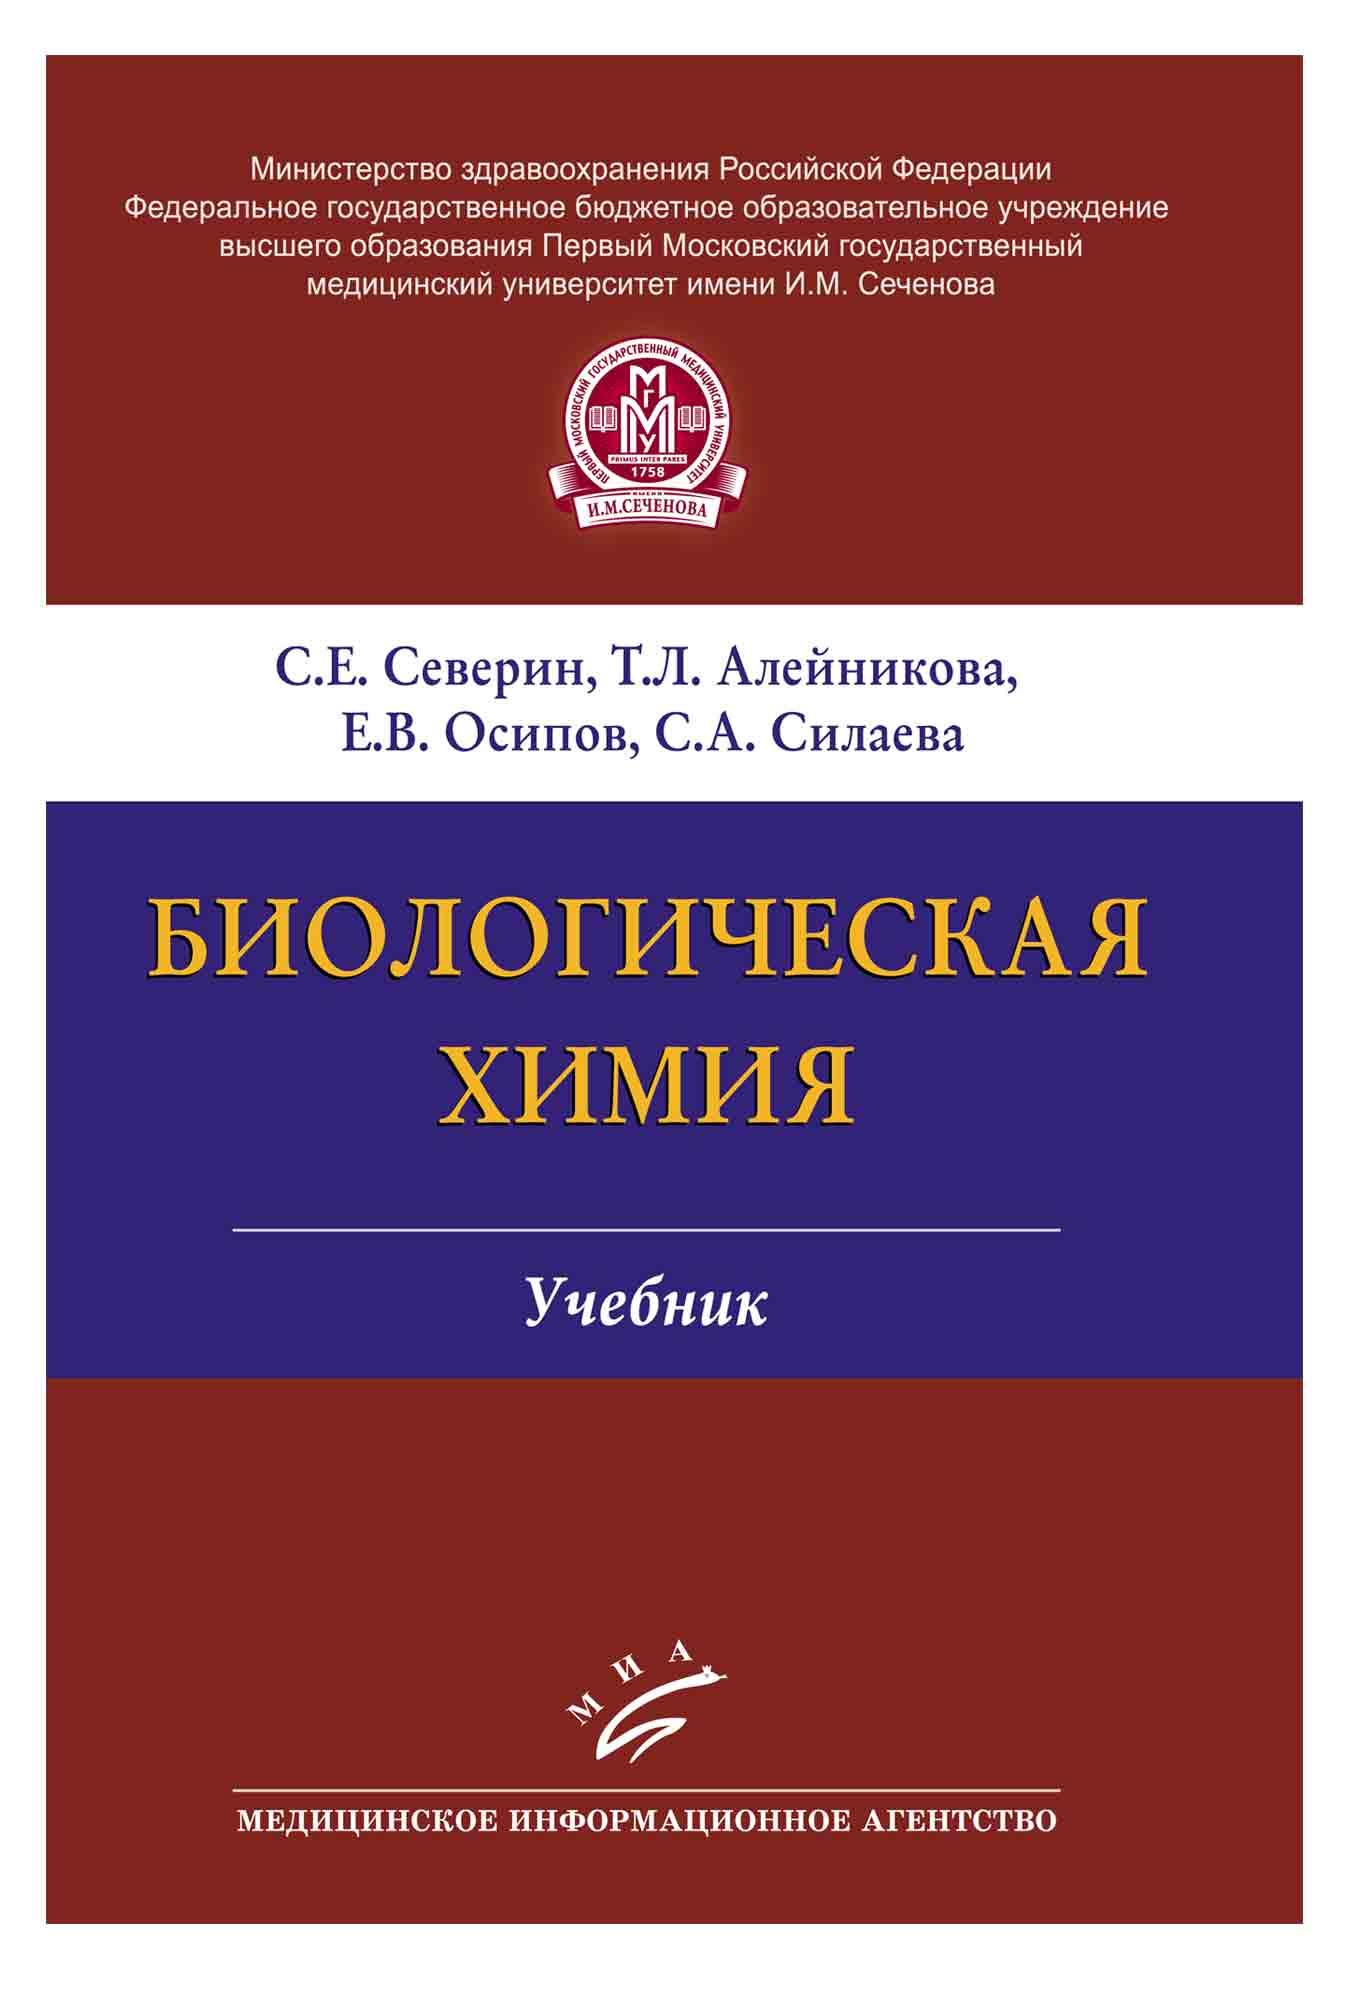 farmakologii-retsepturoy-biohimii-uchebnik-2004-severin-buri